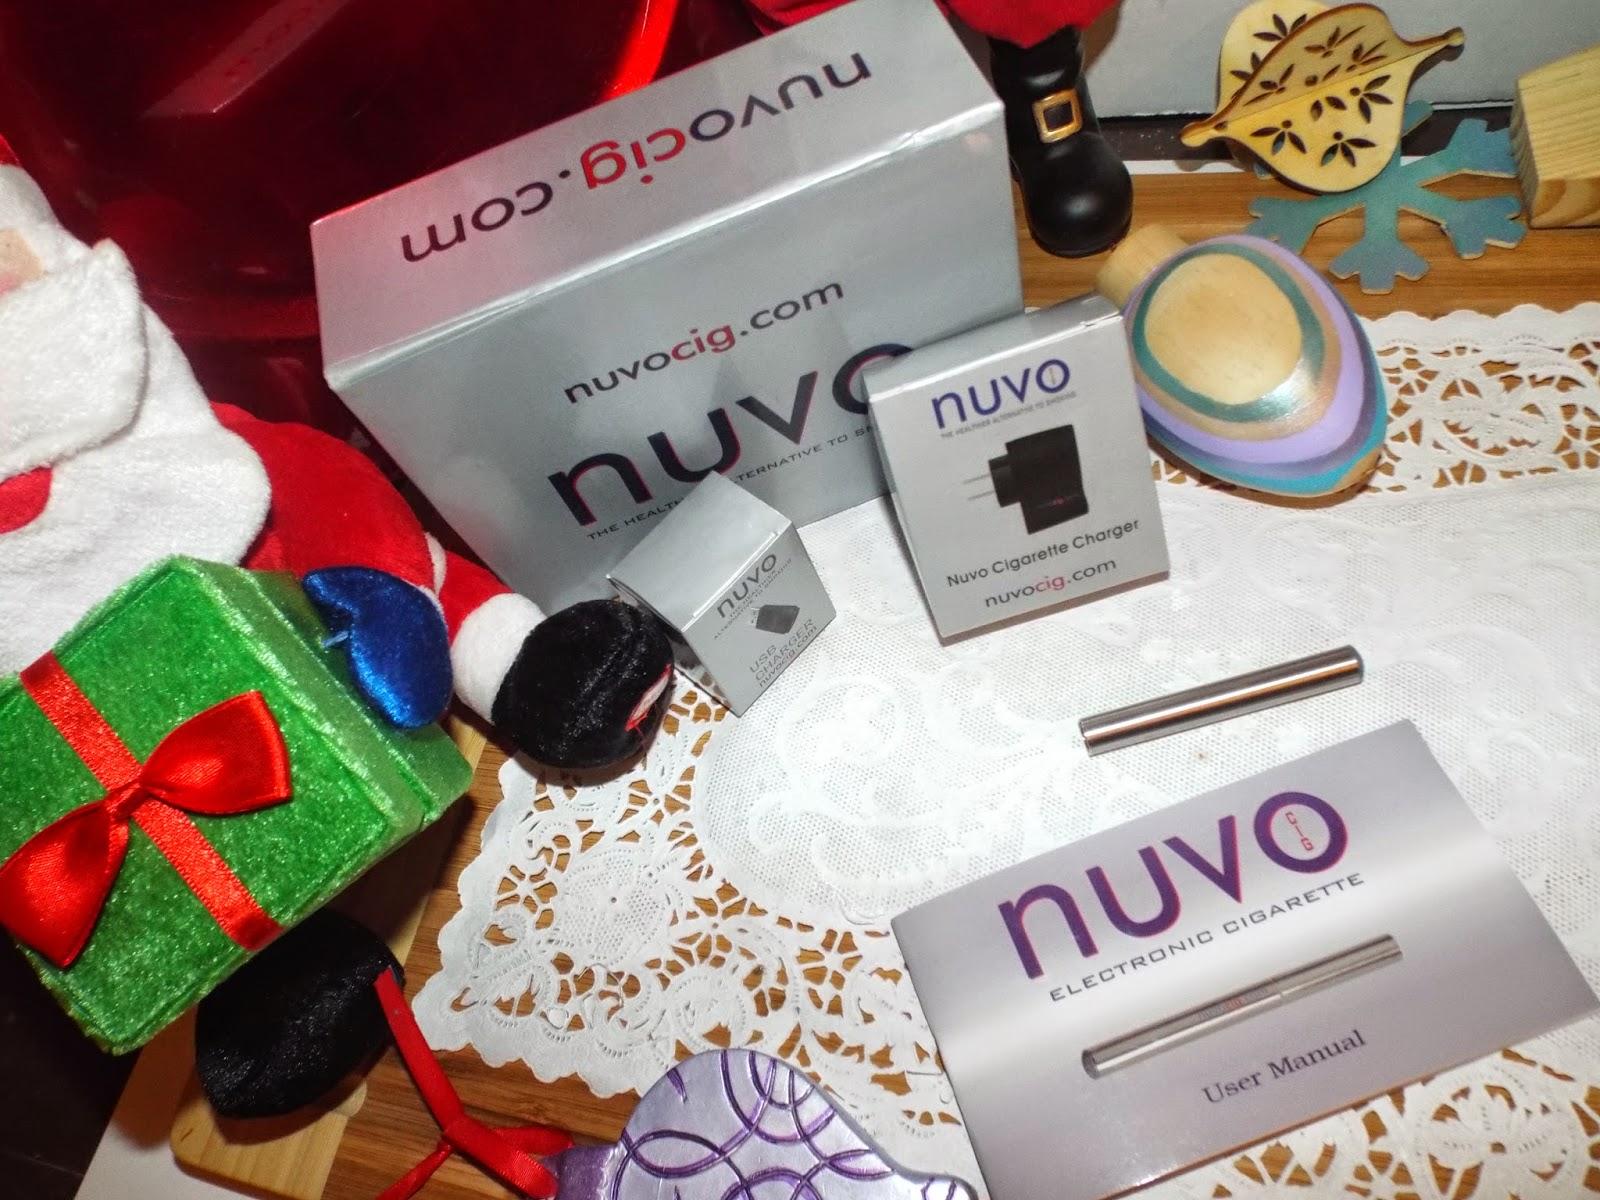 NuvoCig.com Deluxe Vaporizer Kit